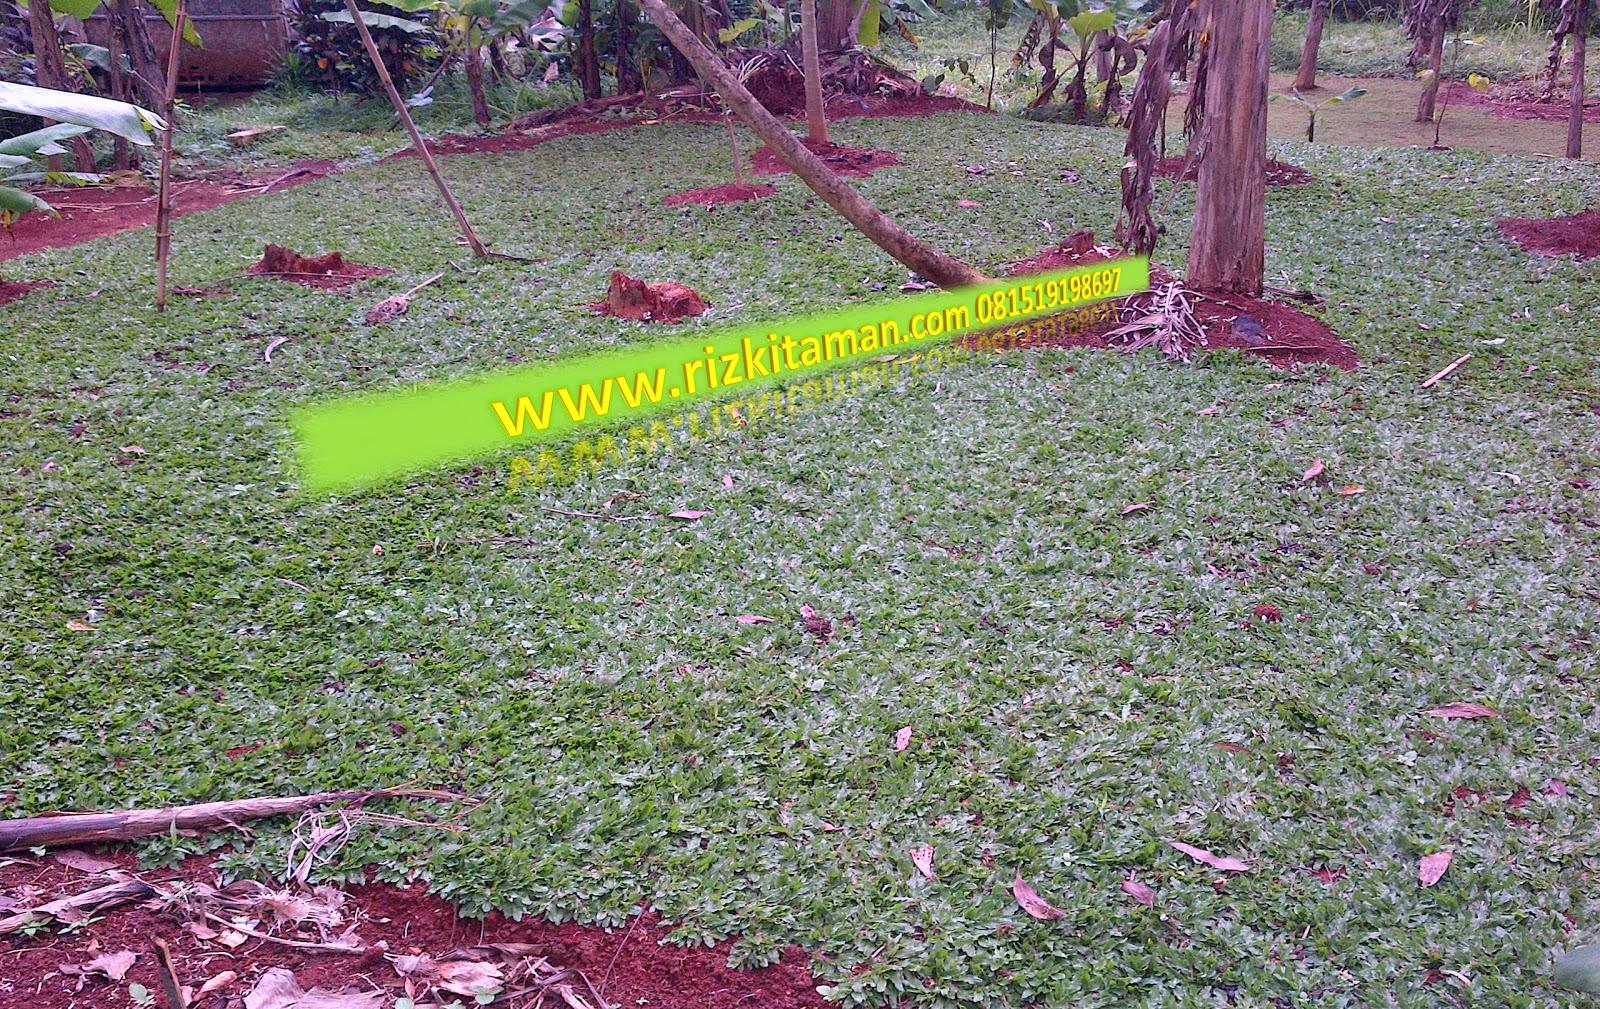 Jual rumput gajah mini sekaligus jasa penanaman rumput dan pembuatan taman | solusi pertamanan